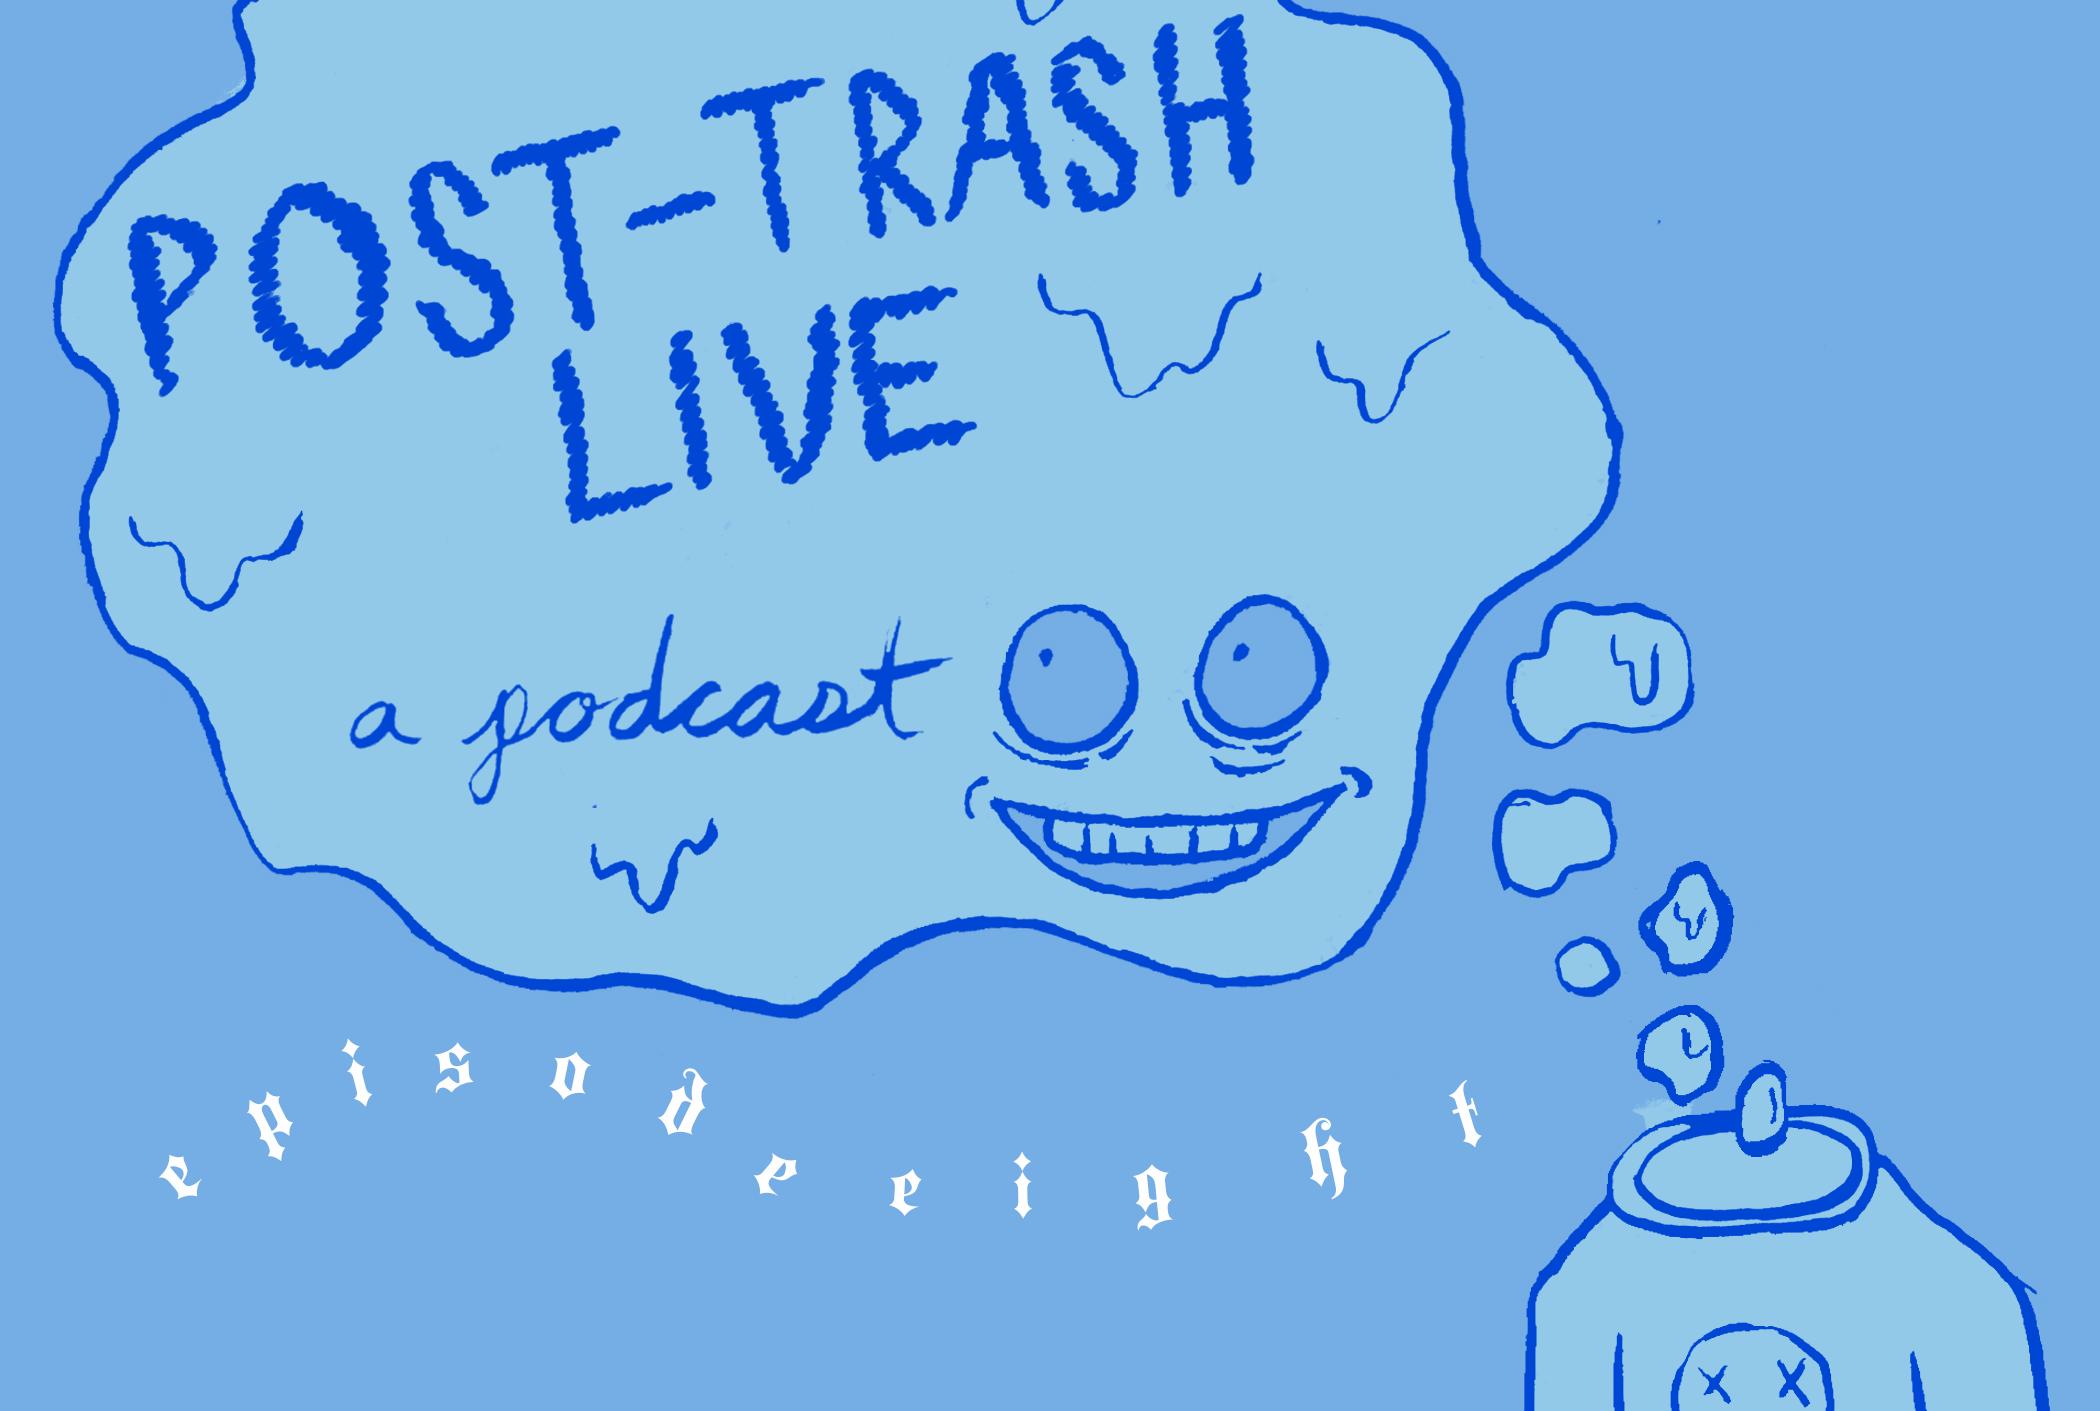 post-trash-podcast_final.png